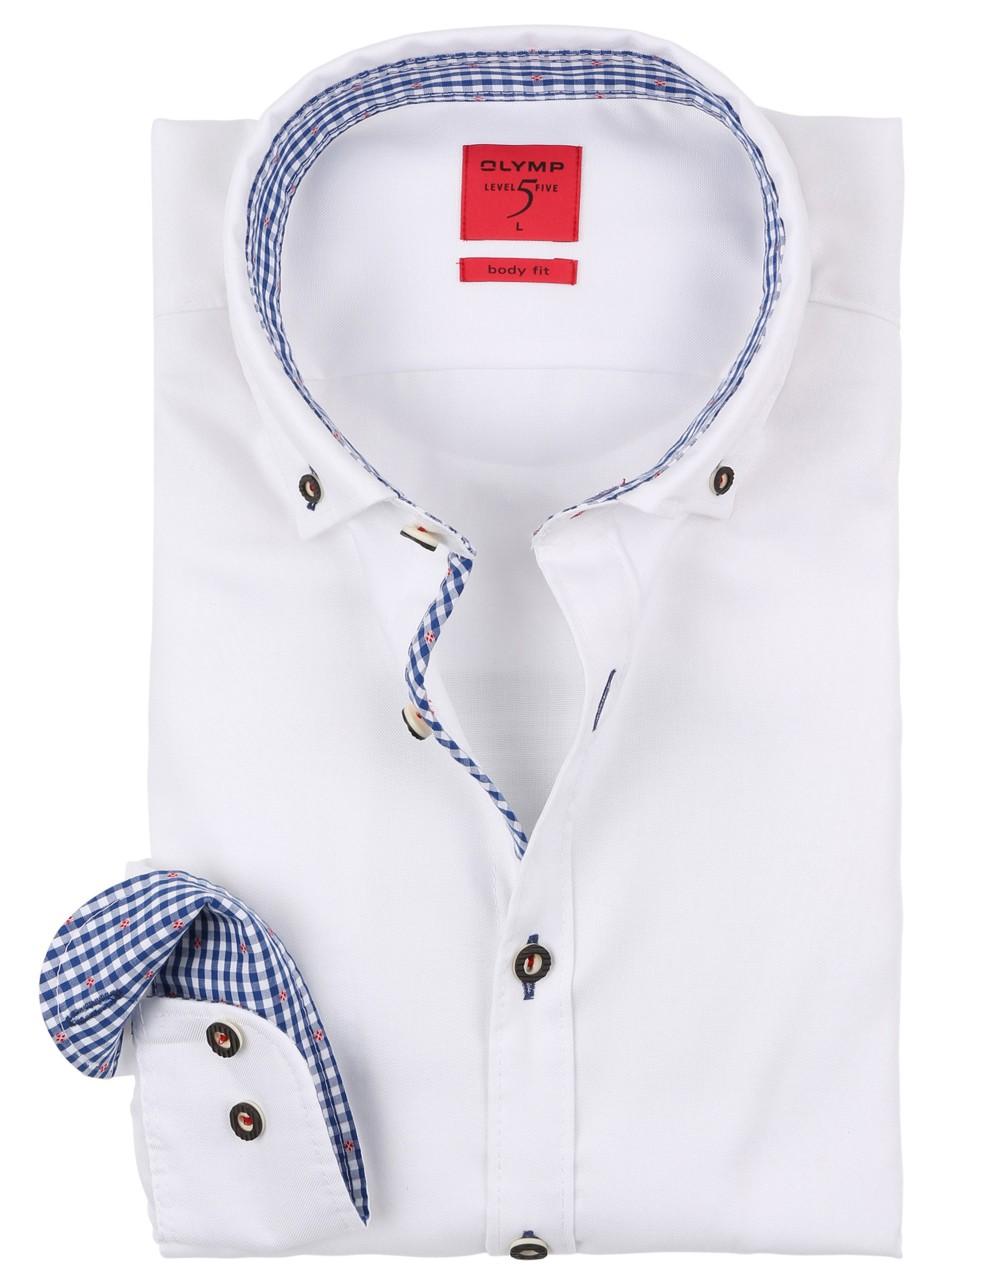 Trachtenhemd Olymp weiß